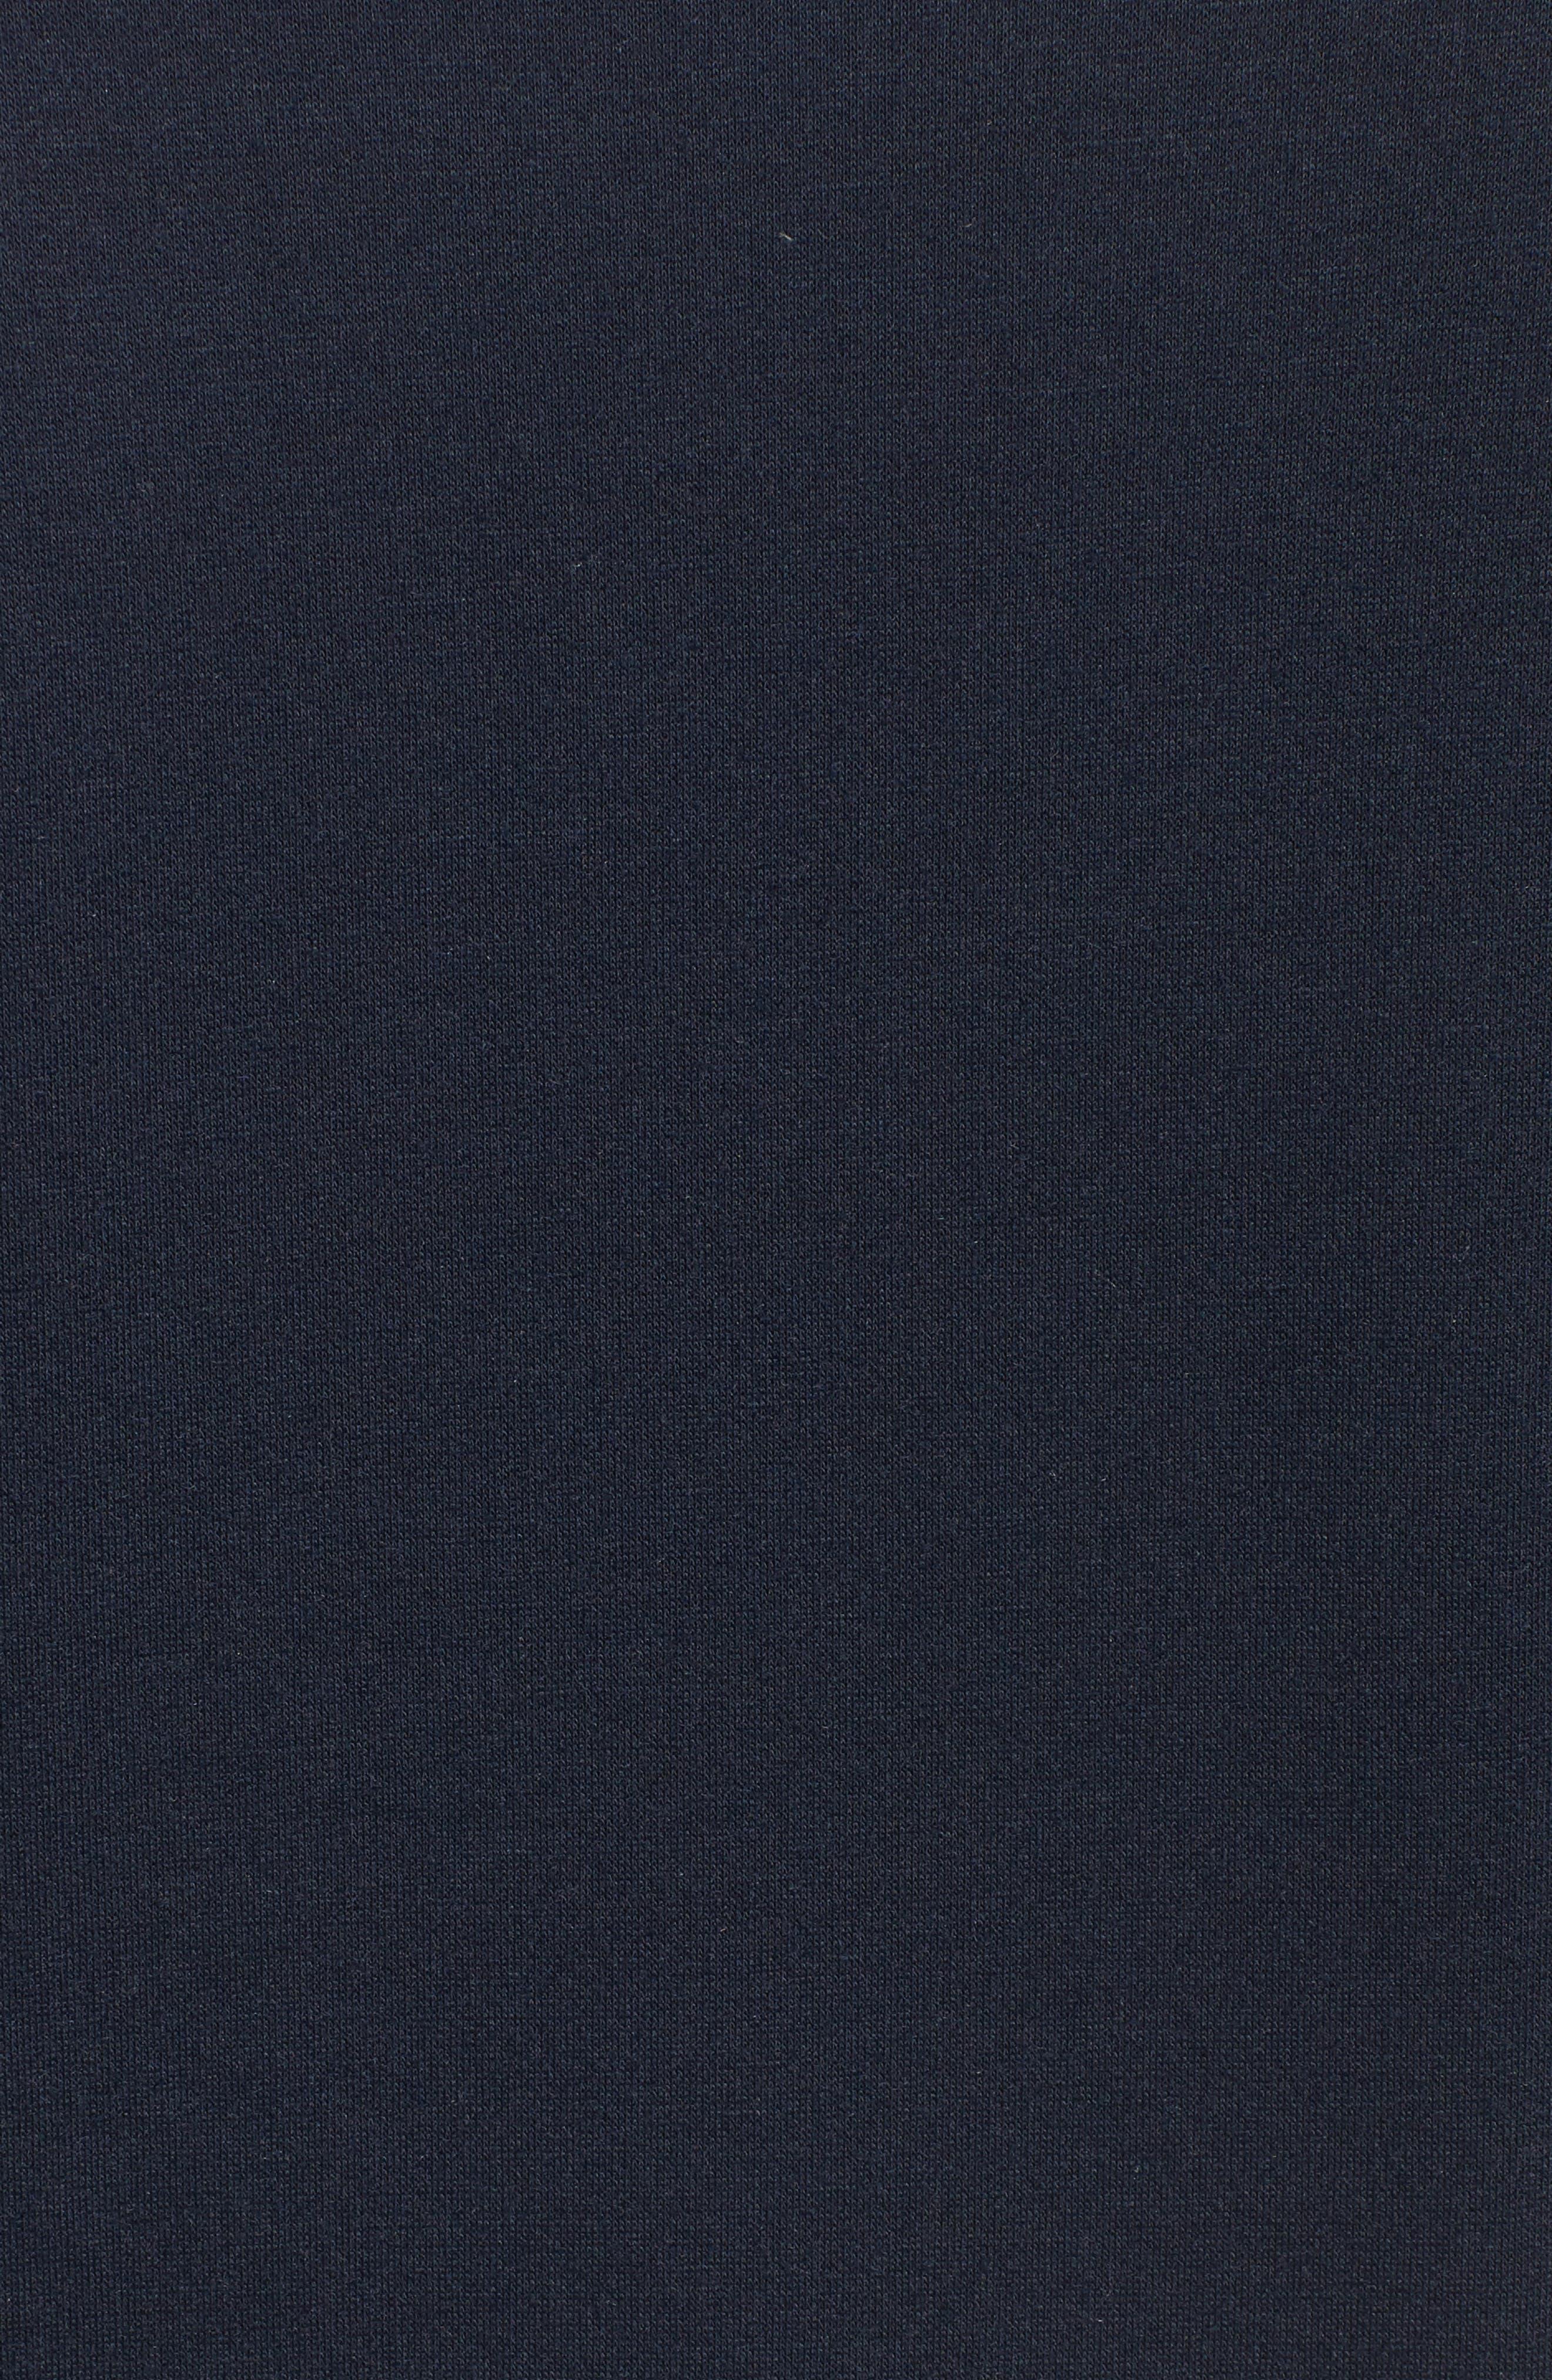 Ruffle Sleeve Sweatshirt,                             Alternate thumbnail 19, color,